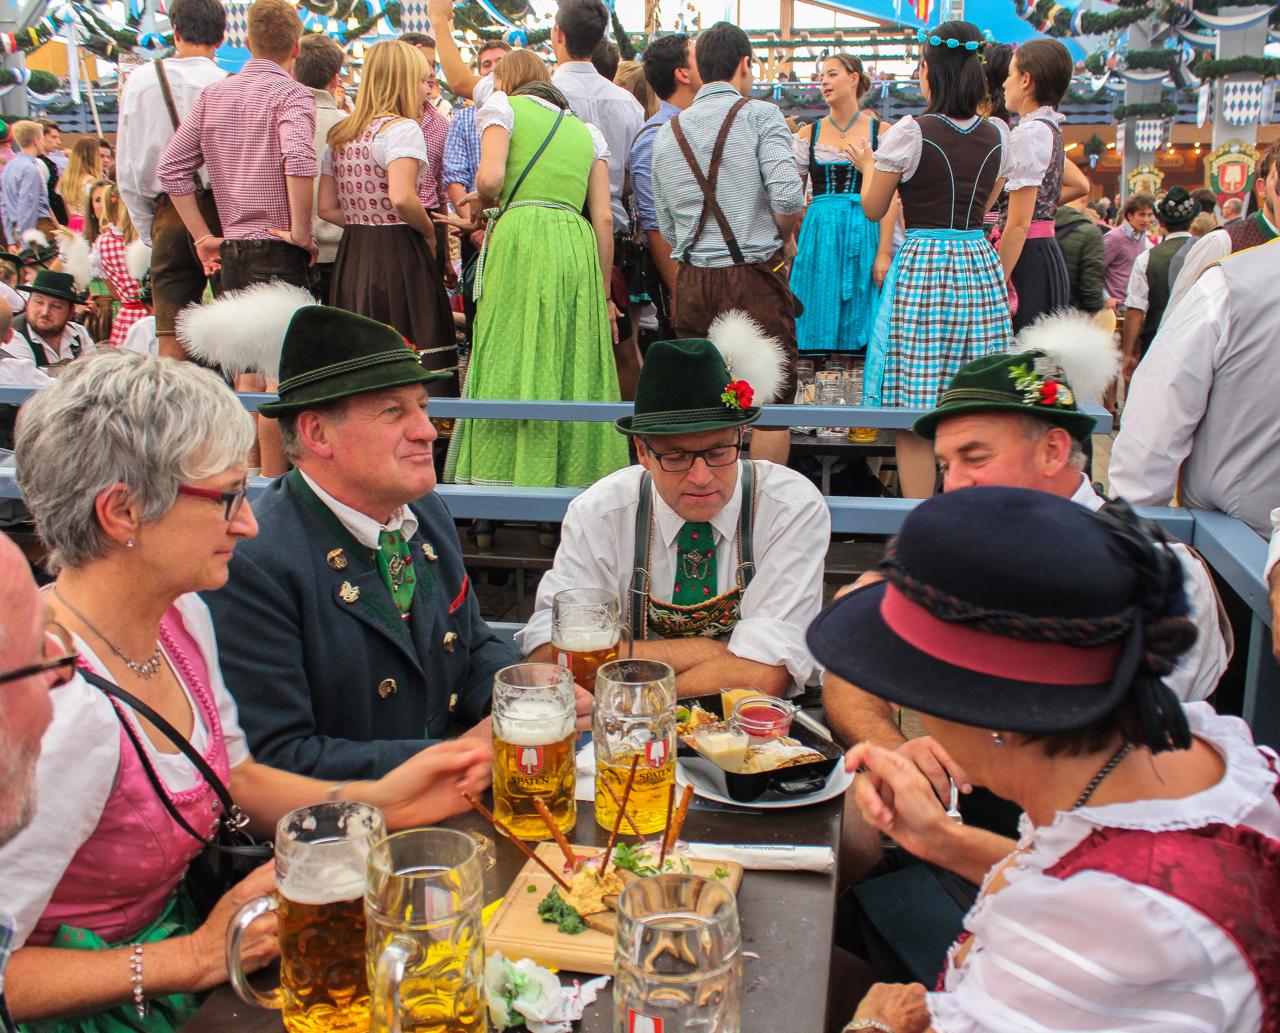 Beer tent Oktoberfest Munich  sc 1 st  Adventures in Culture & Oktoberfest in Munich: A Guide to the Worldu0027s Greatest Party ...